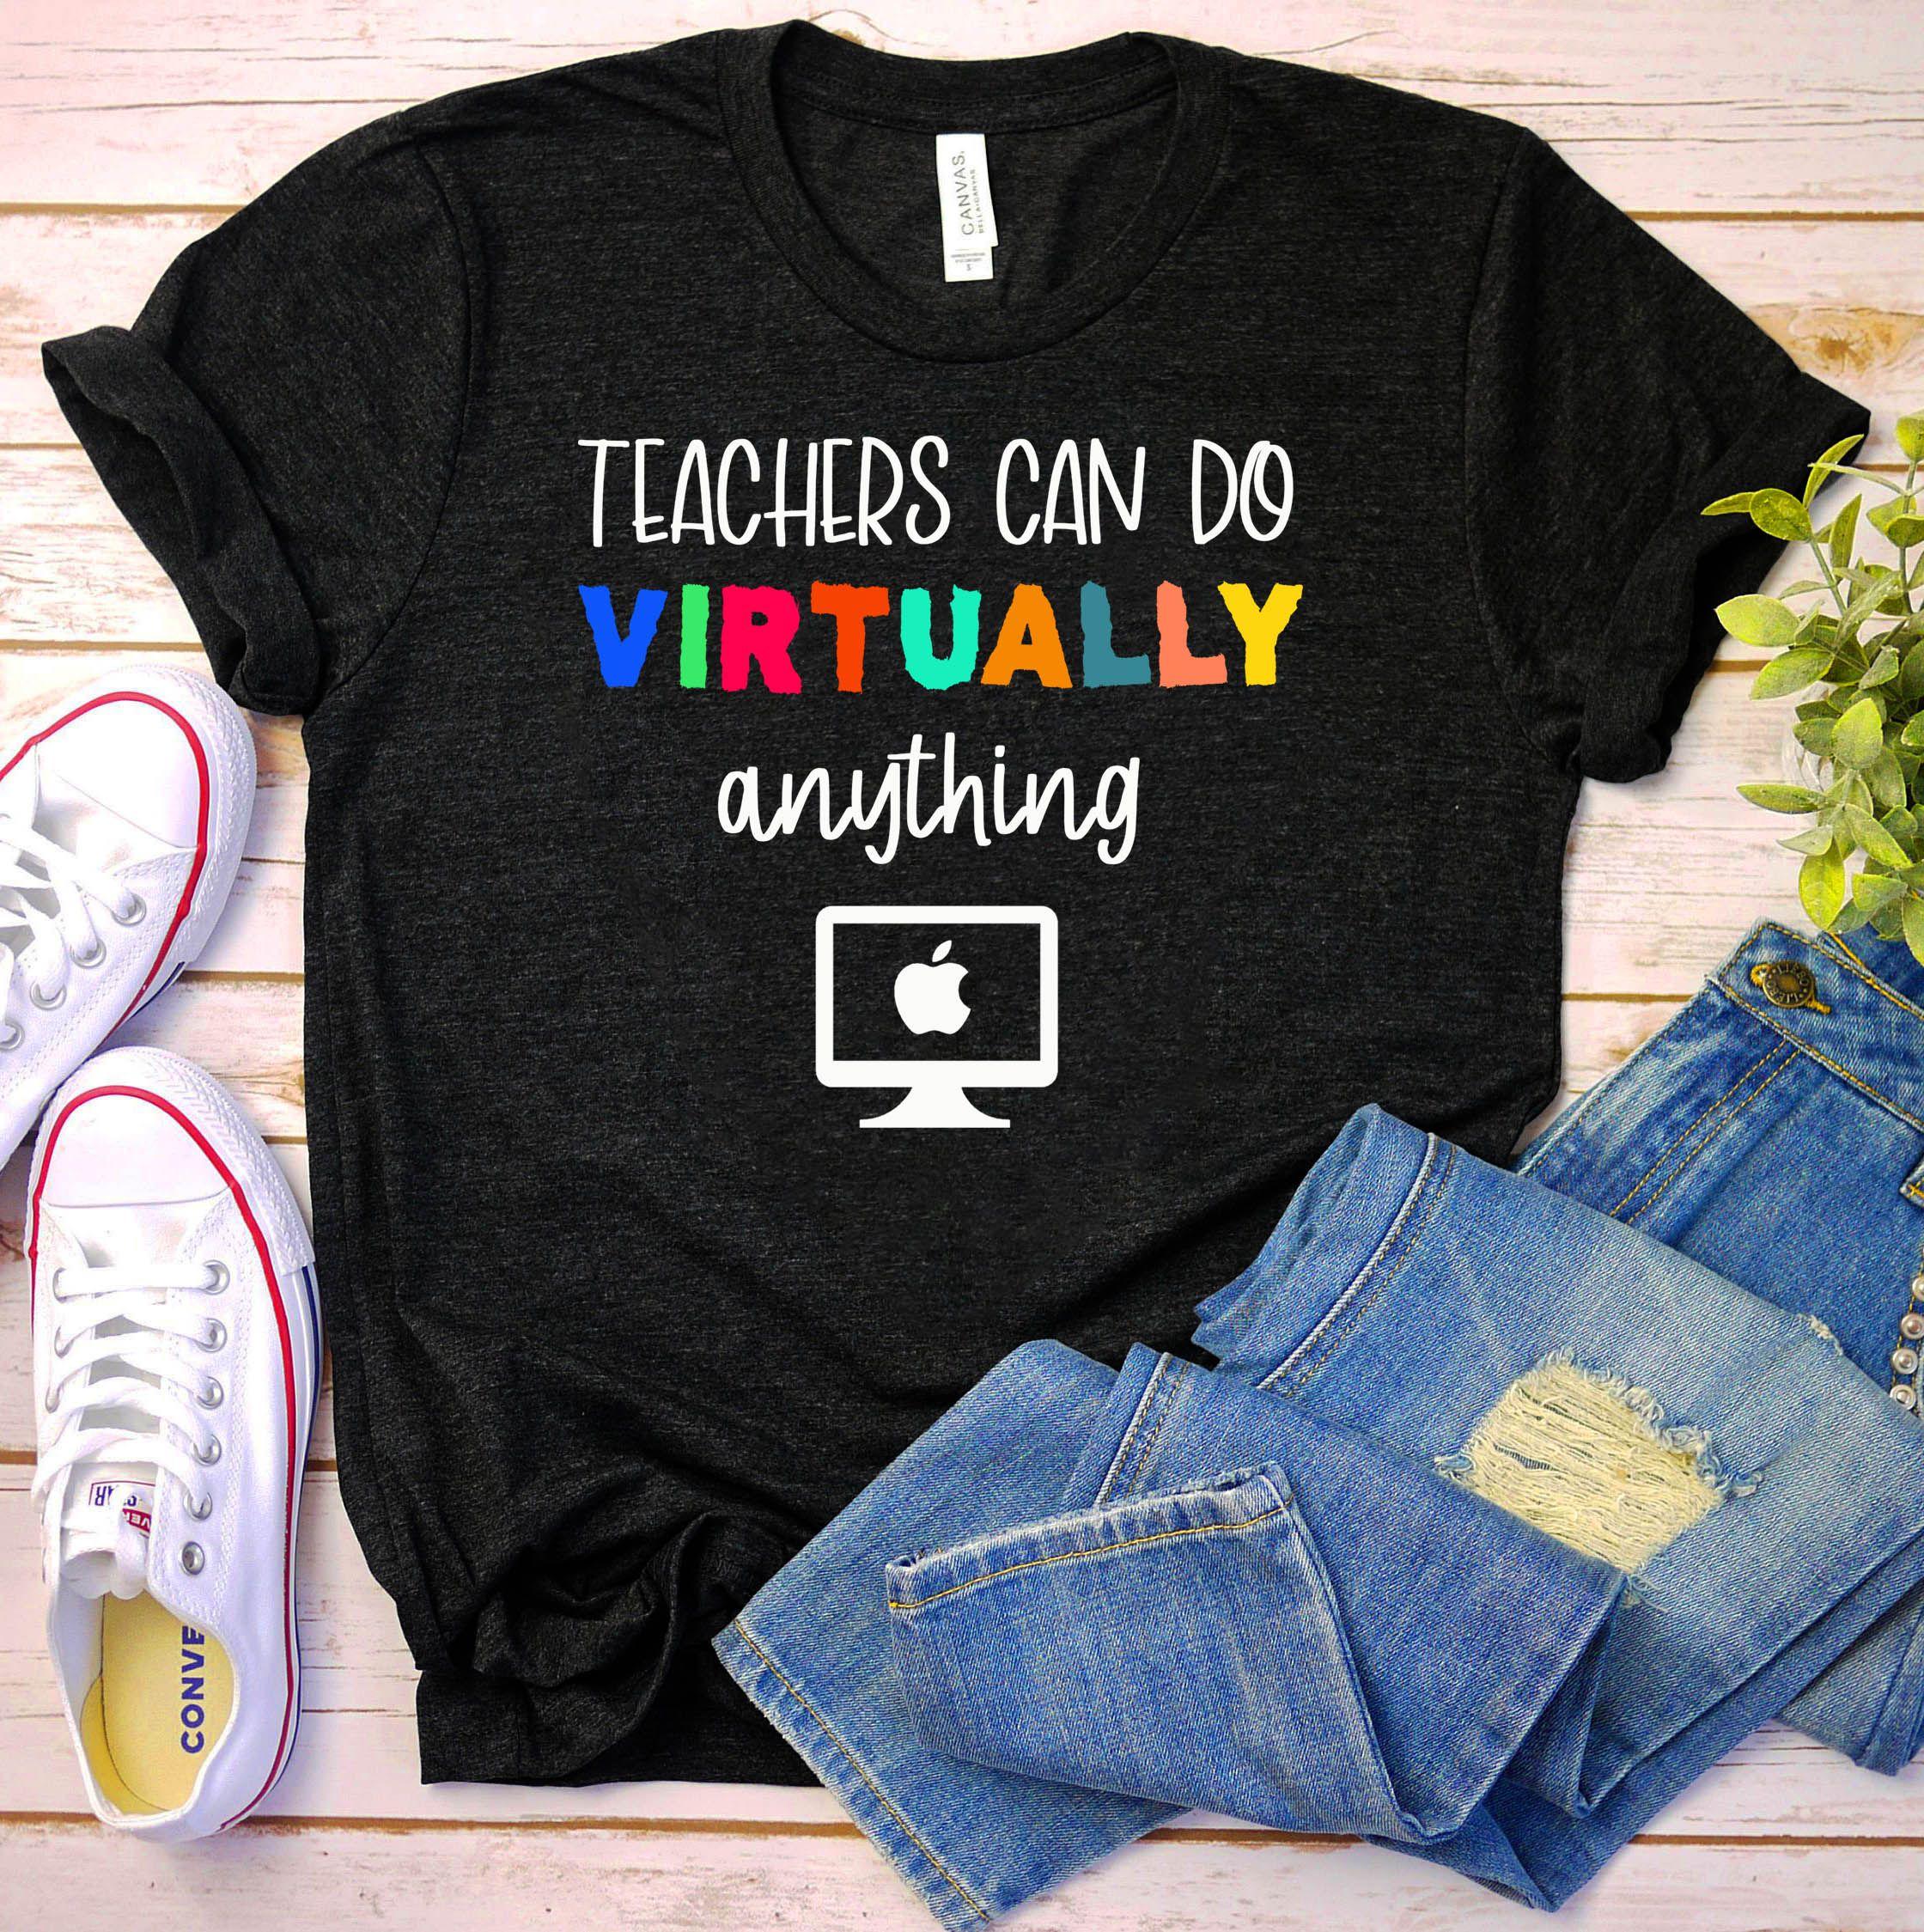 Distance Learning Teachers Can Do Virtually Anything Virtual Teacher Shirt Back To School Nel 2020